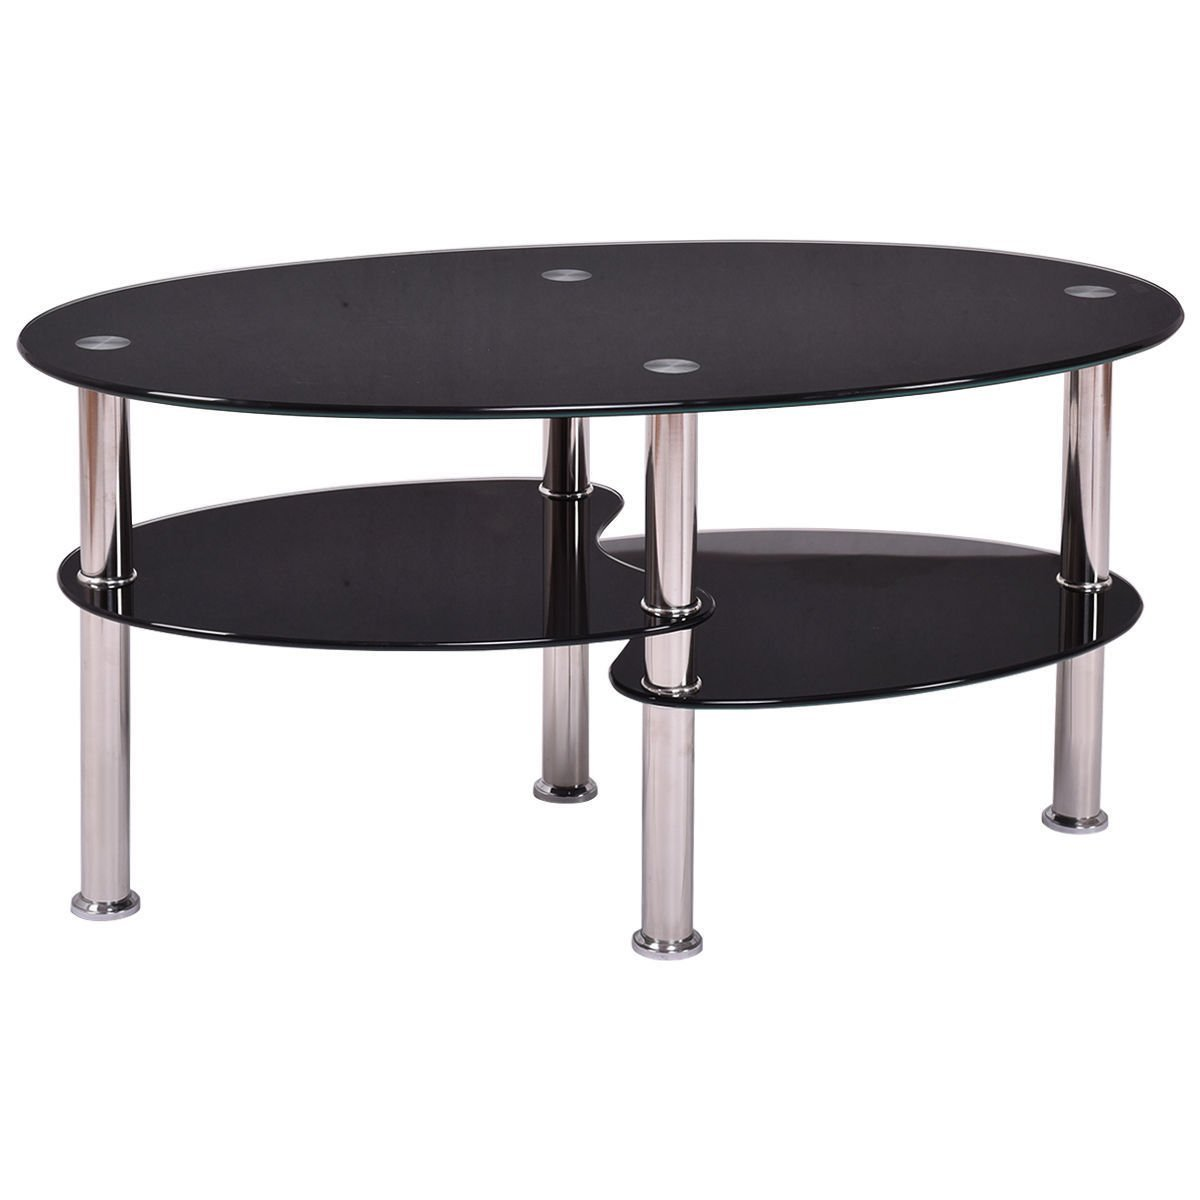 Glass Coffee Table Chrome Base: New Black Glass Oval Side Coffee Table Shelf Chrome Base